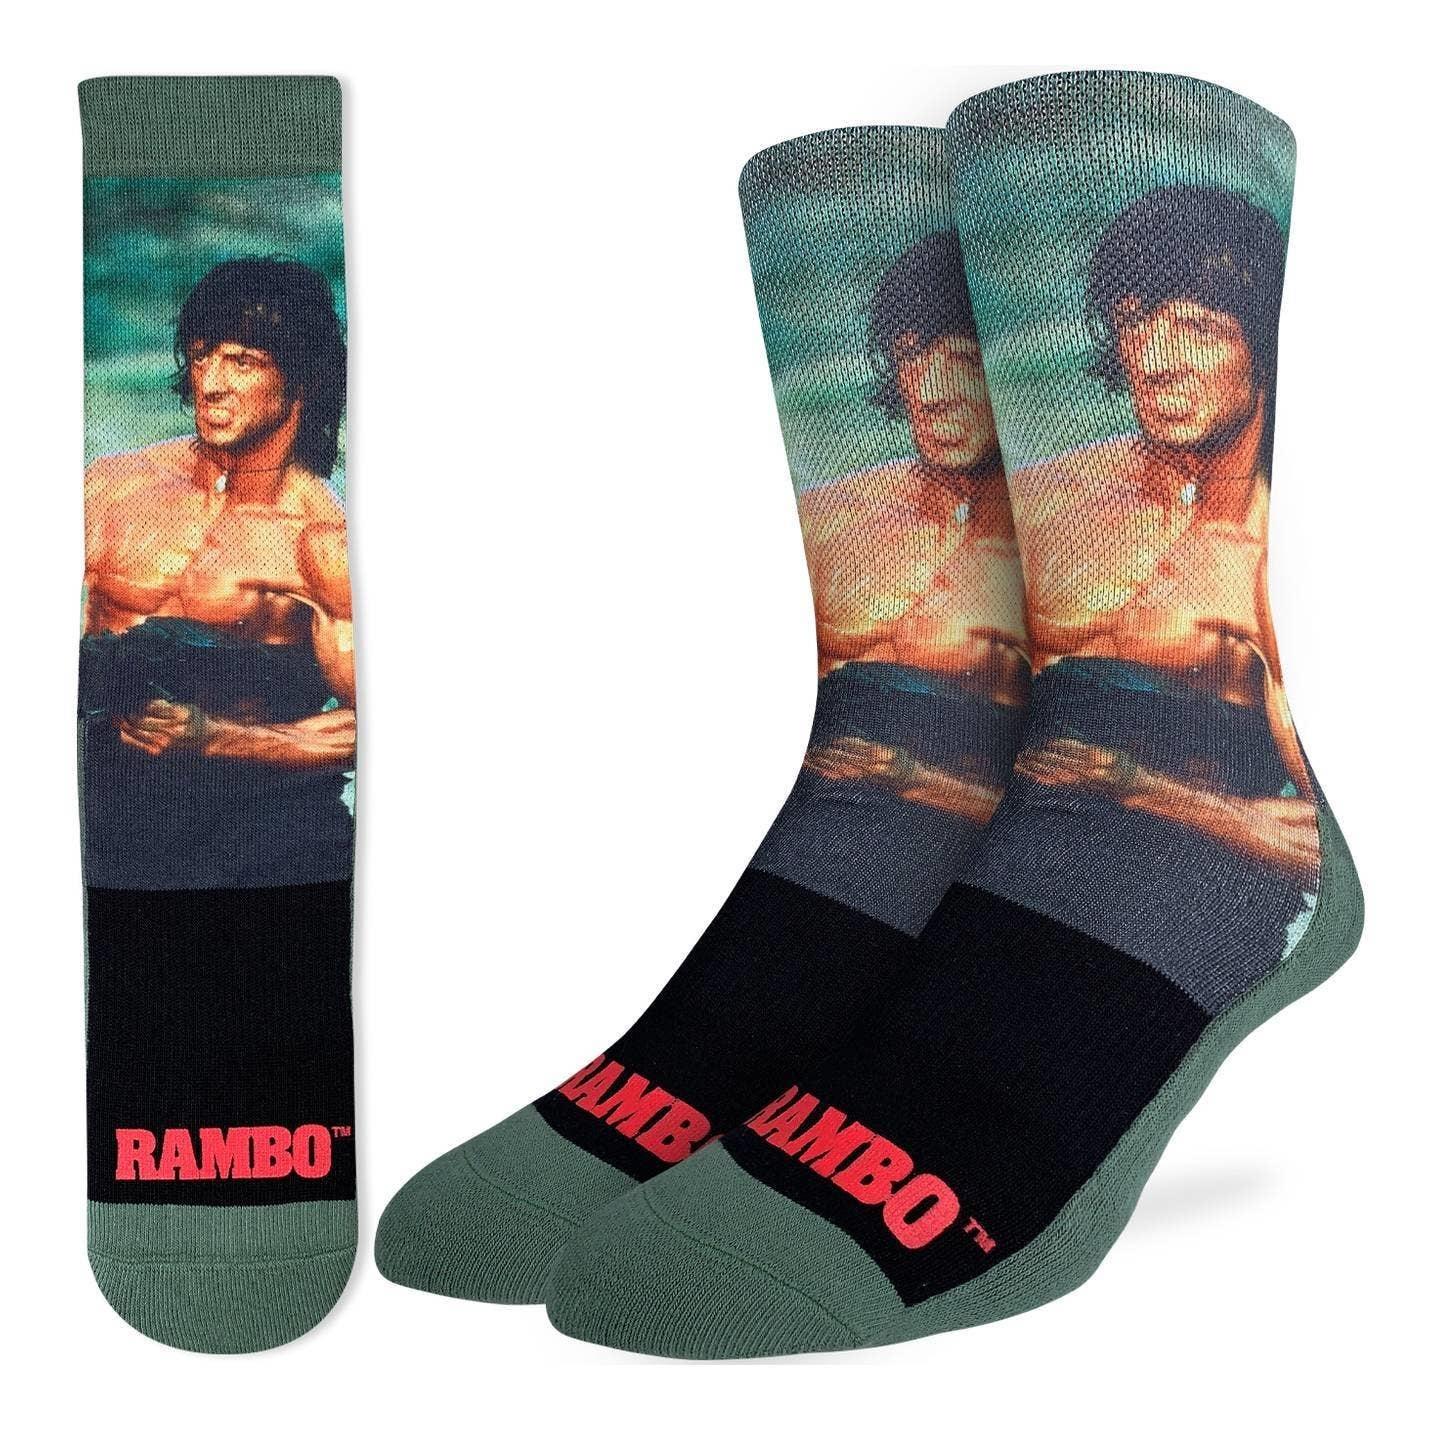 Rambo Men's Crew Socks